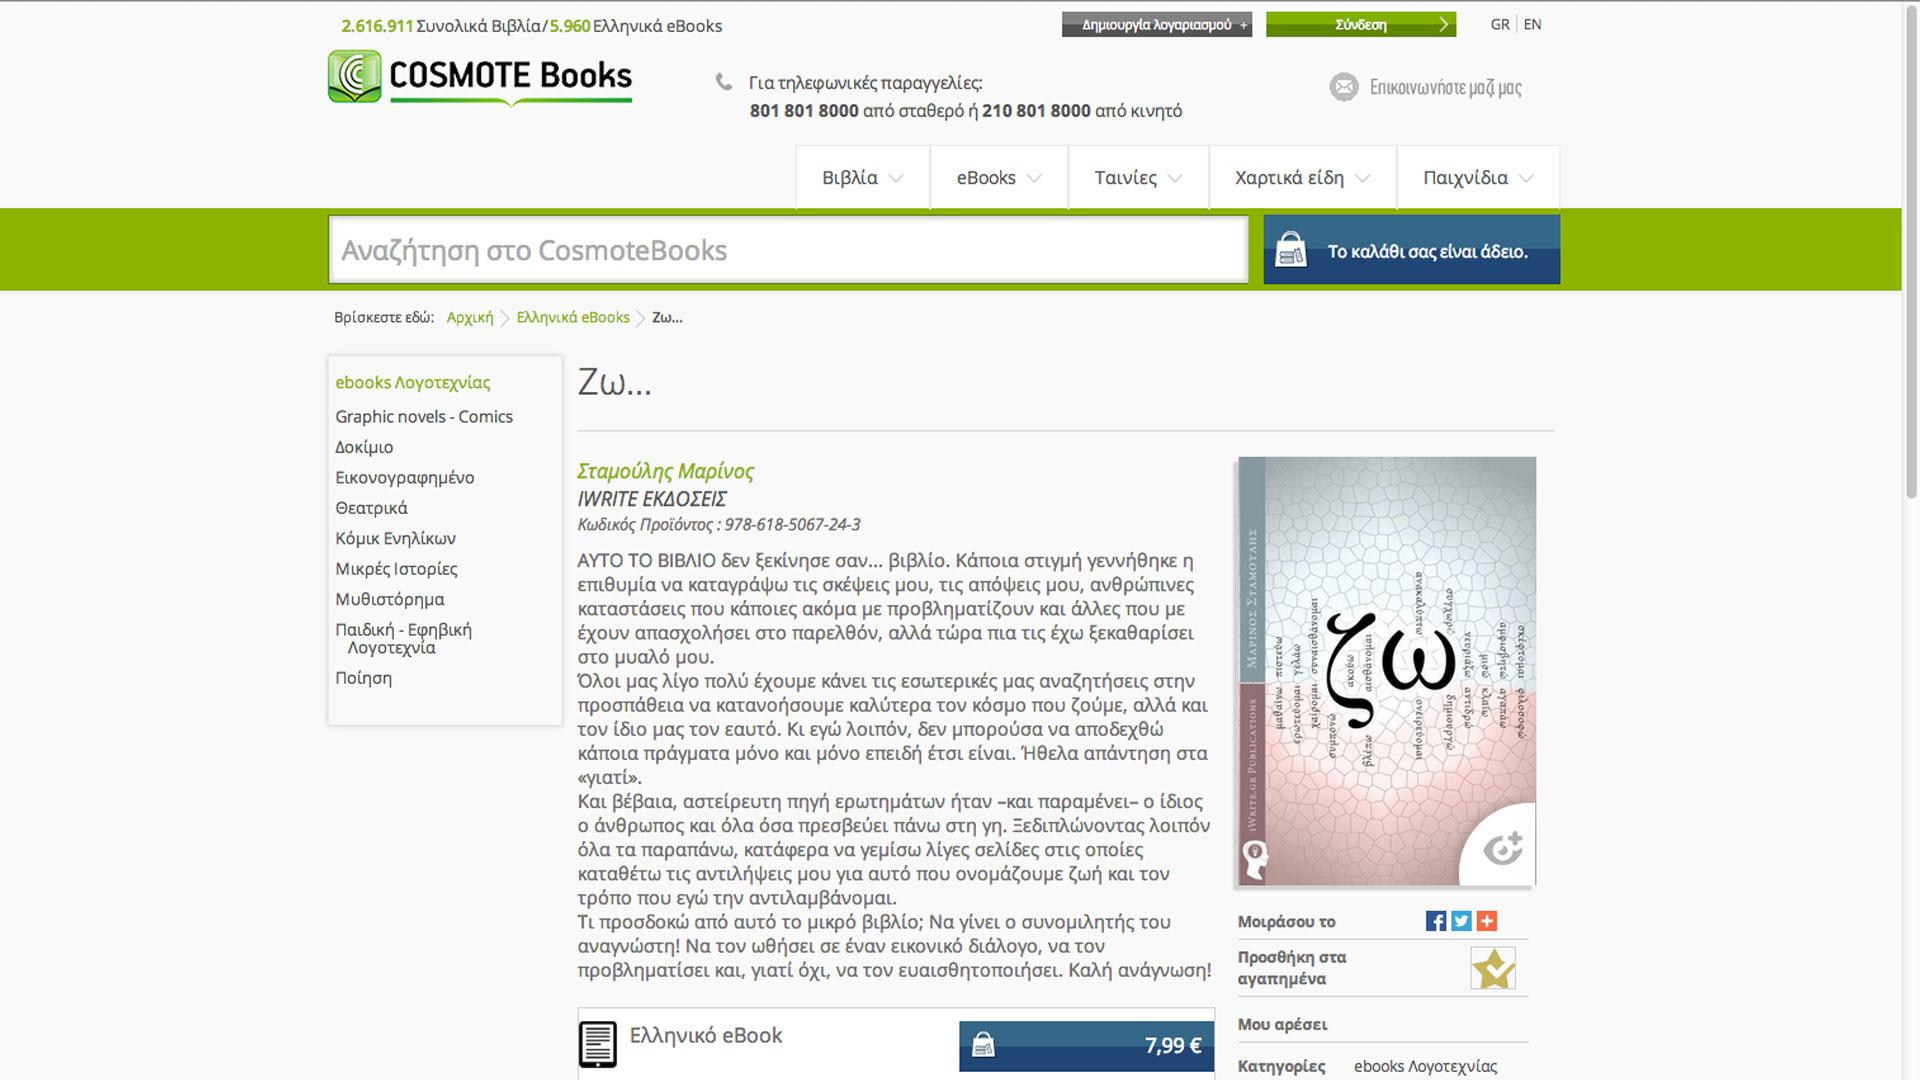 Cosmotebooks